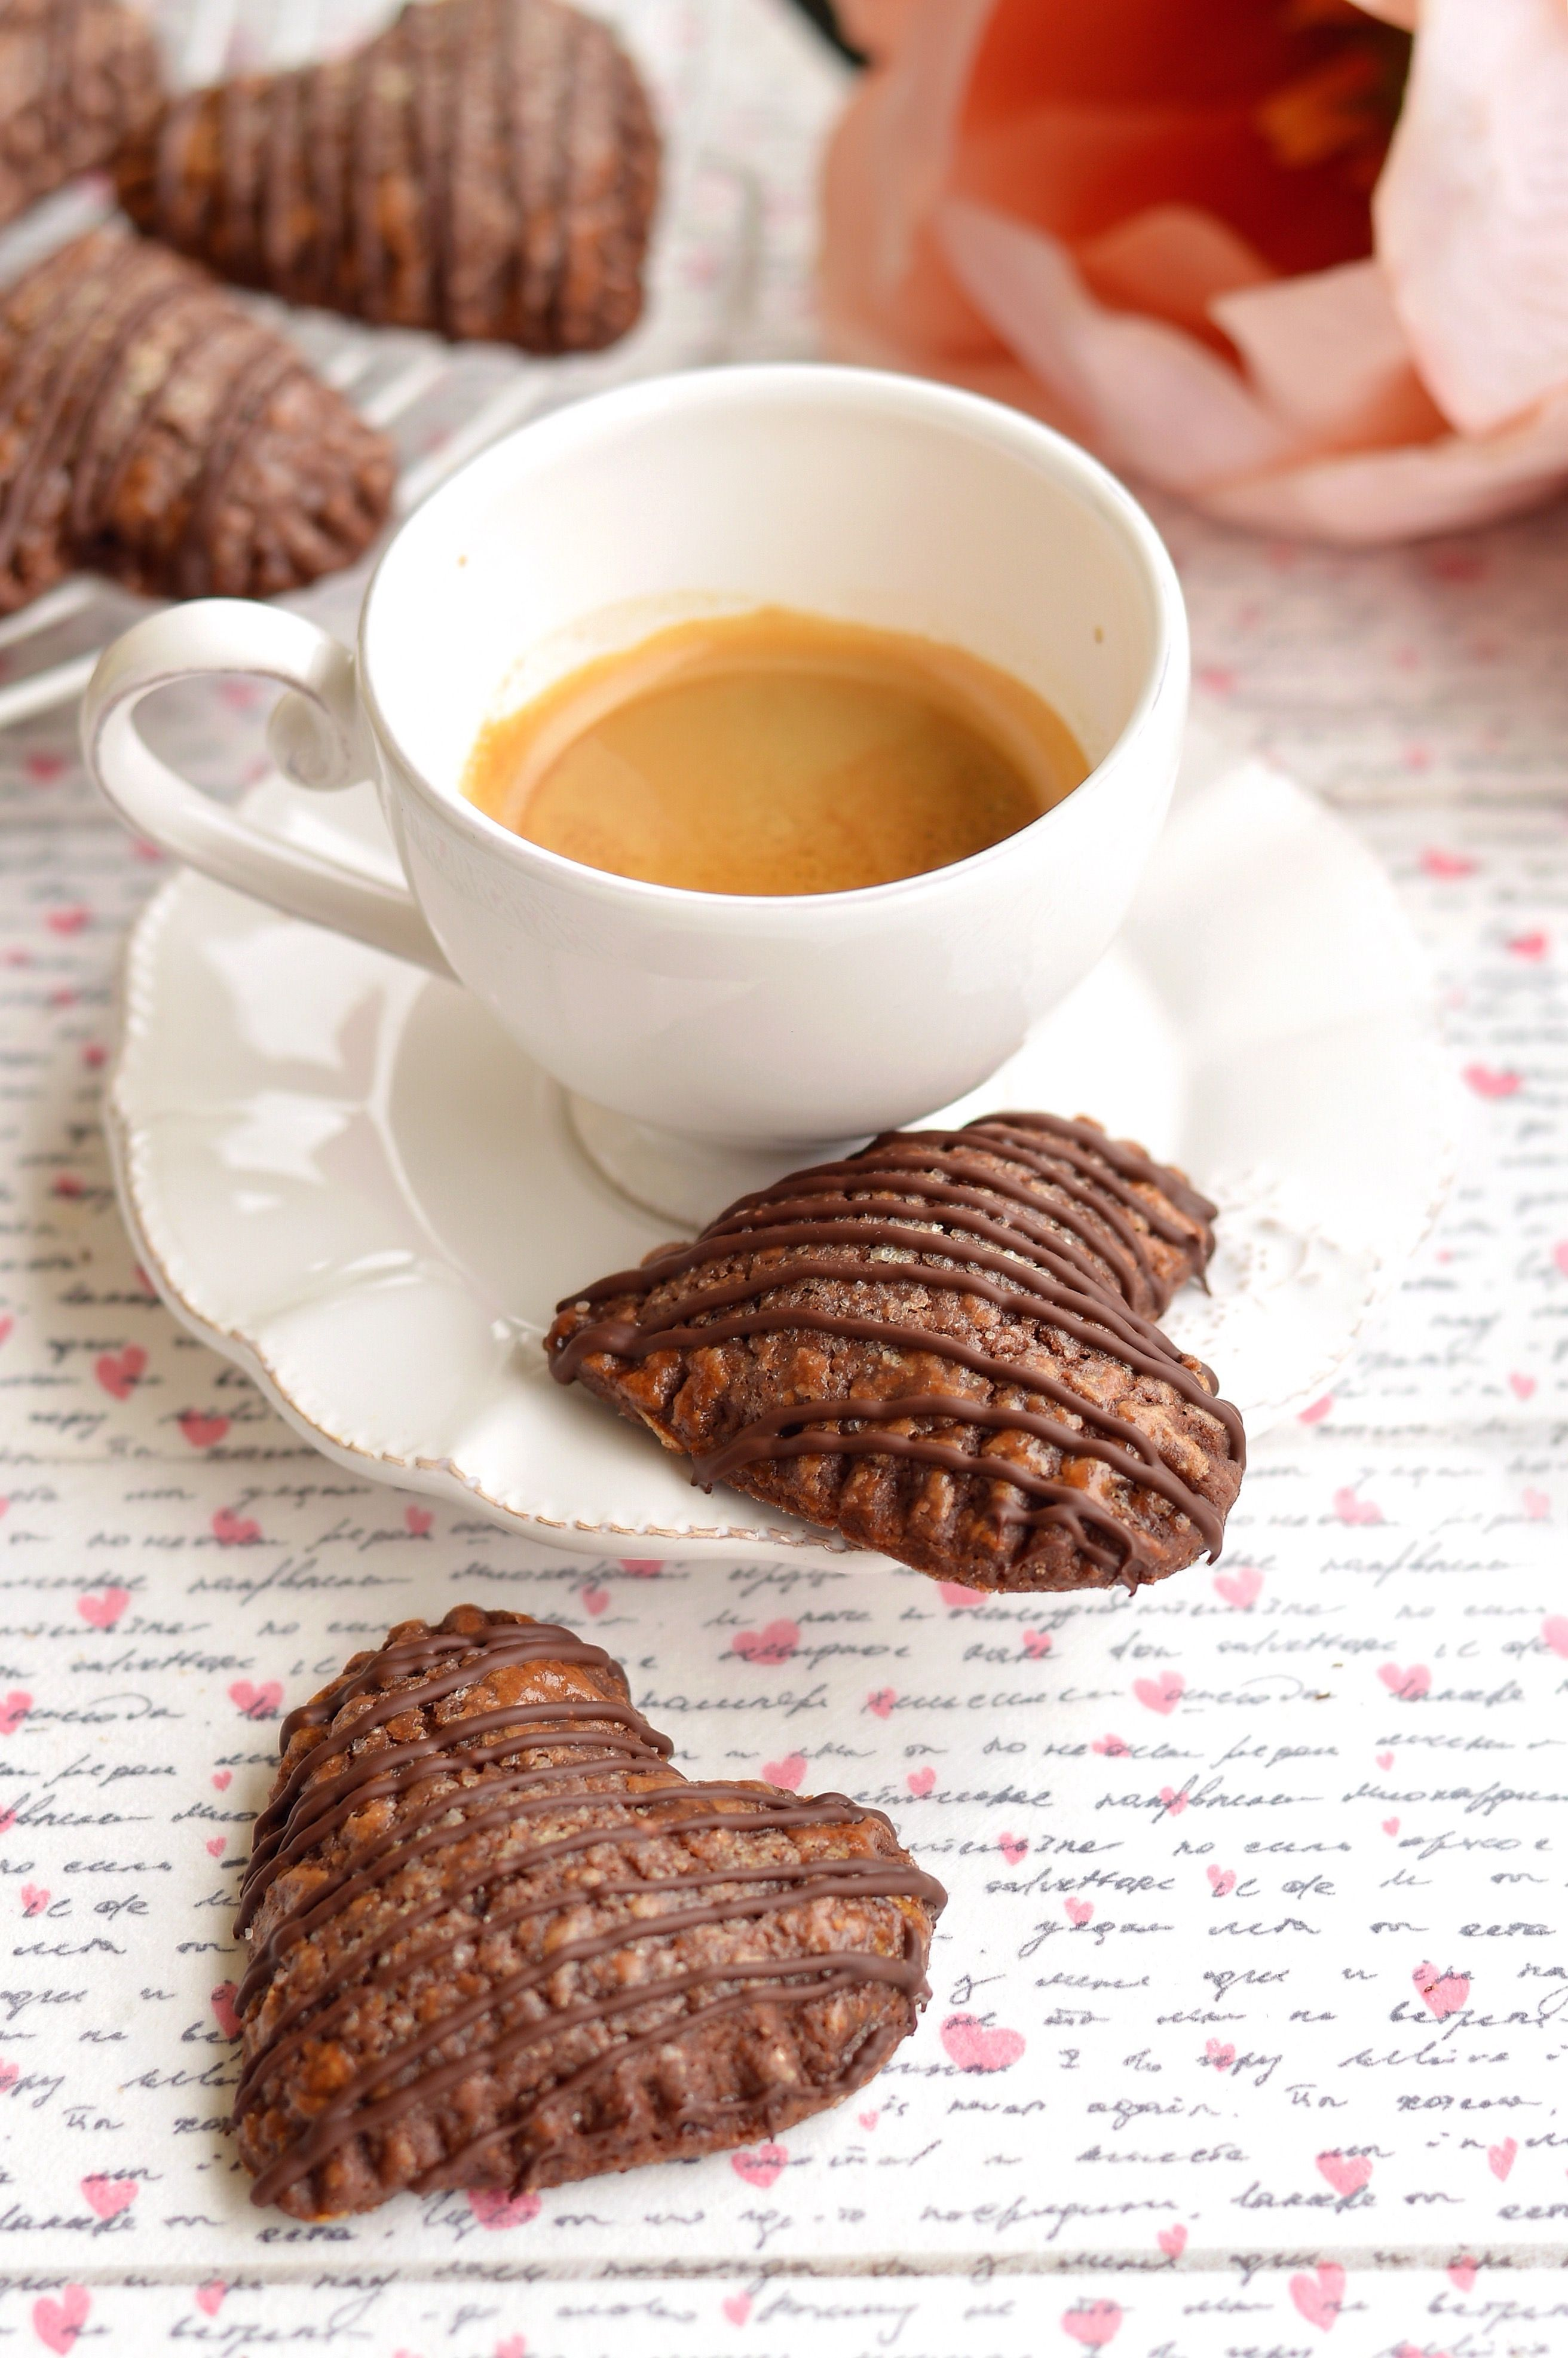 Chocolate heart pies